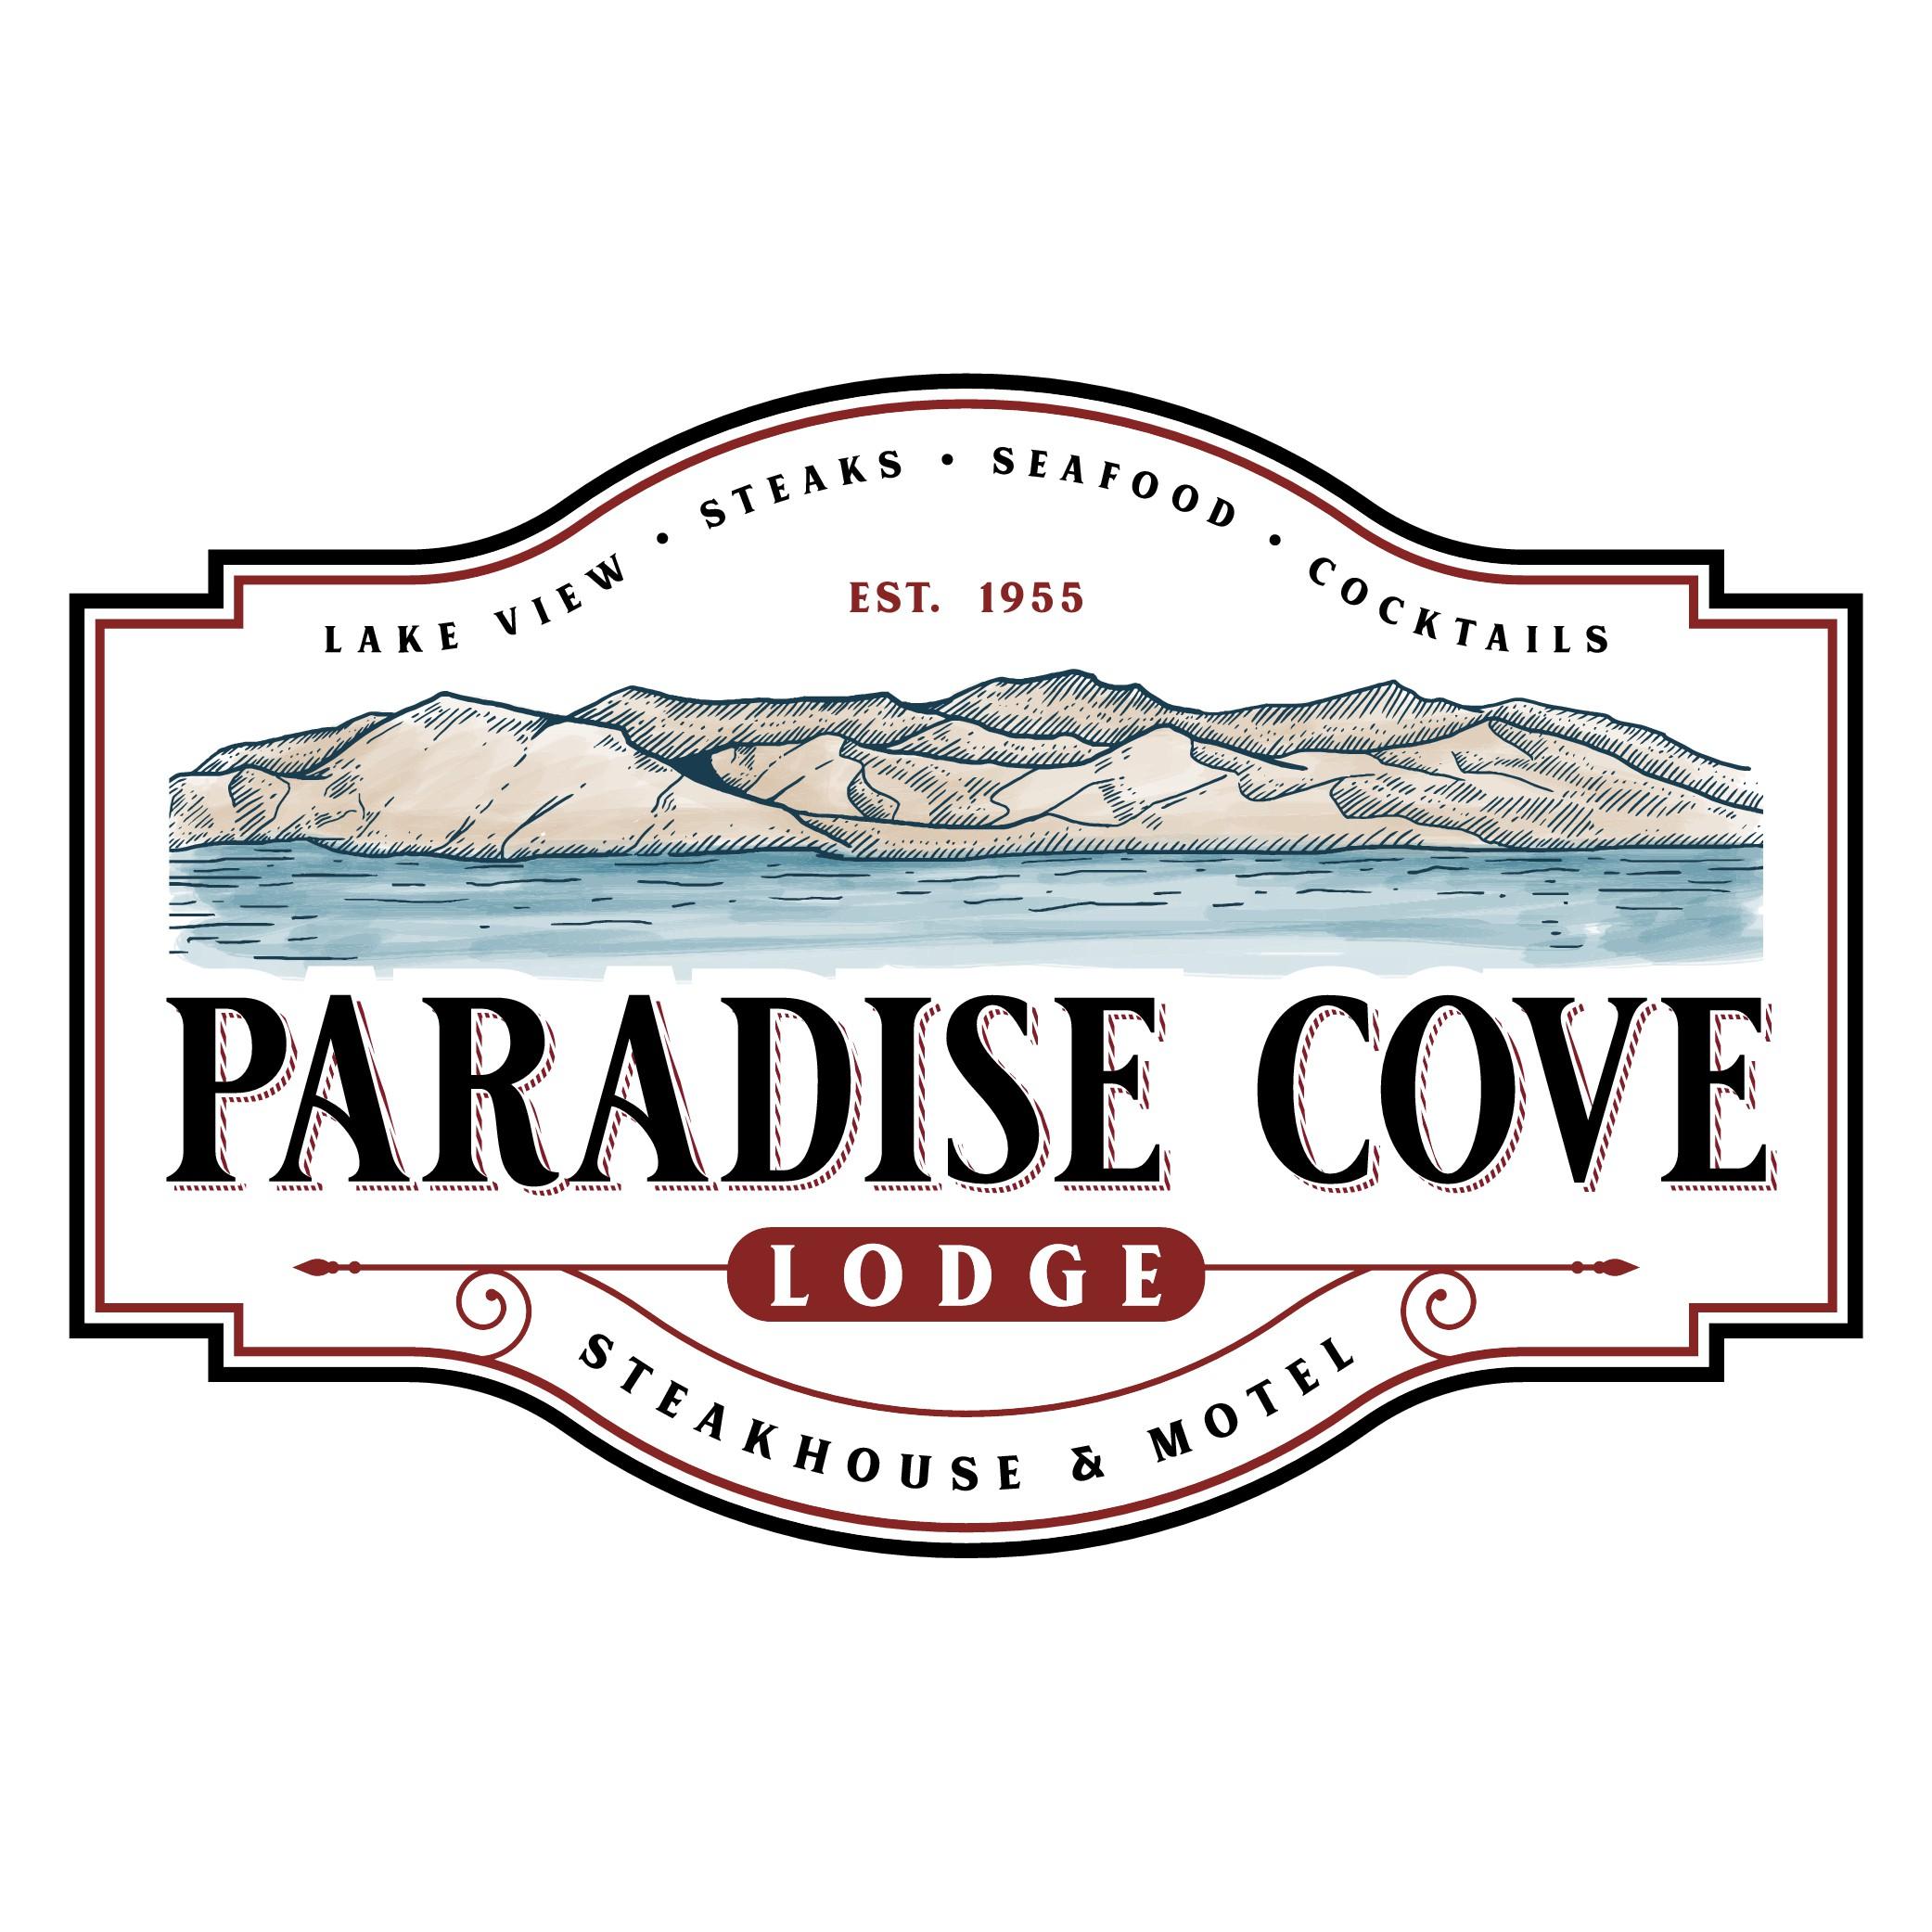 Paradise Cove Lodge logo